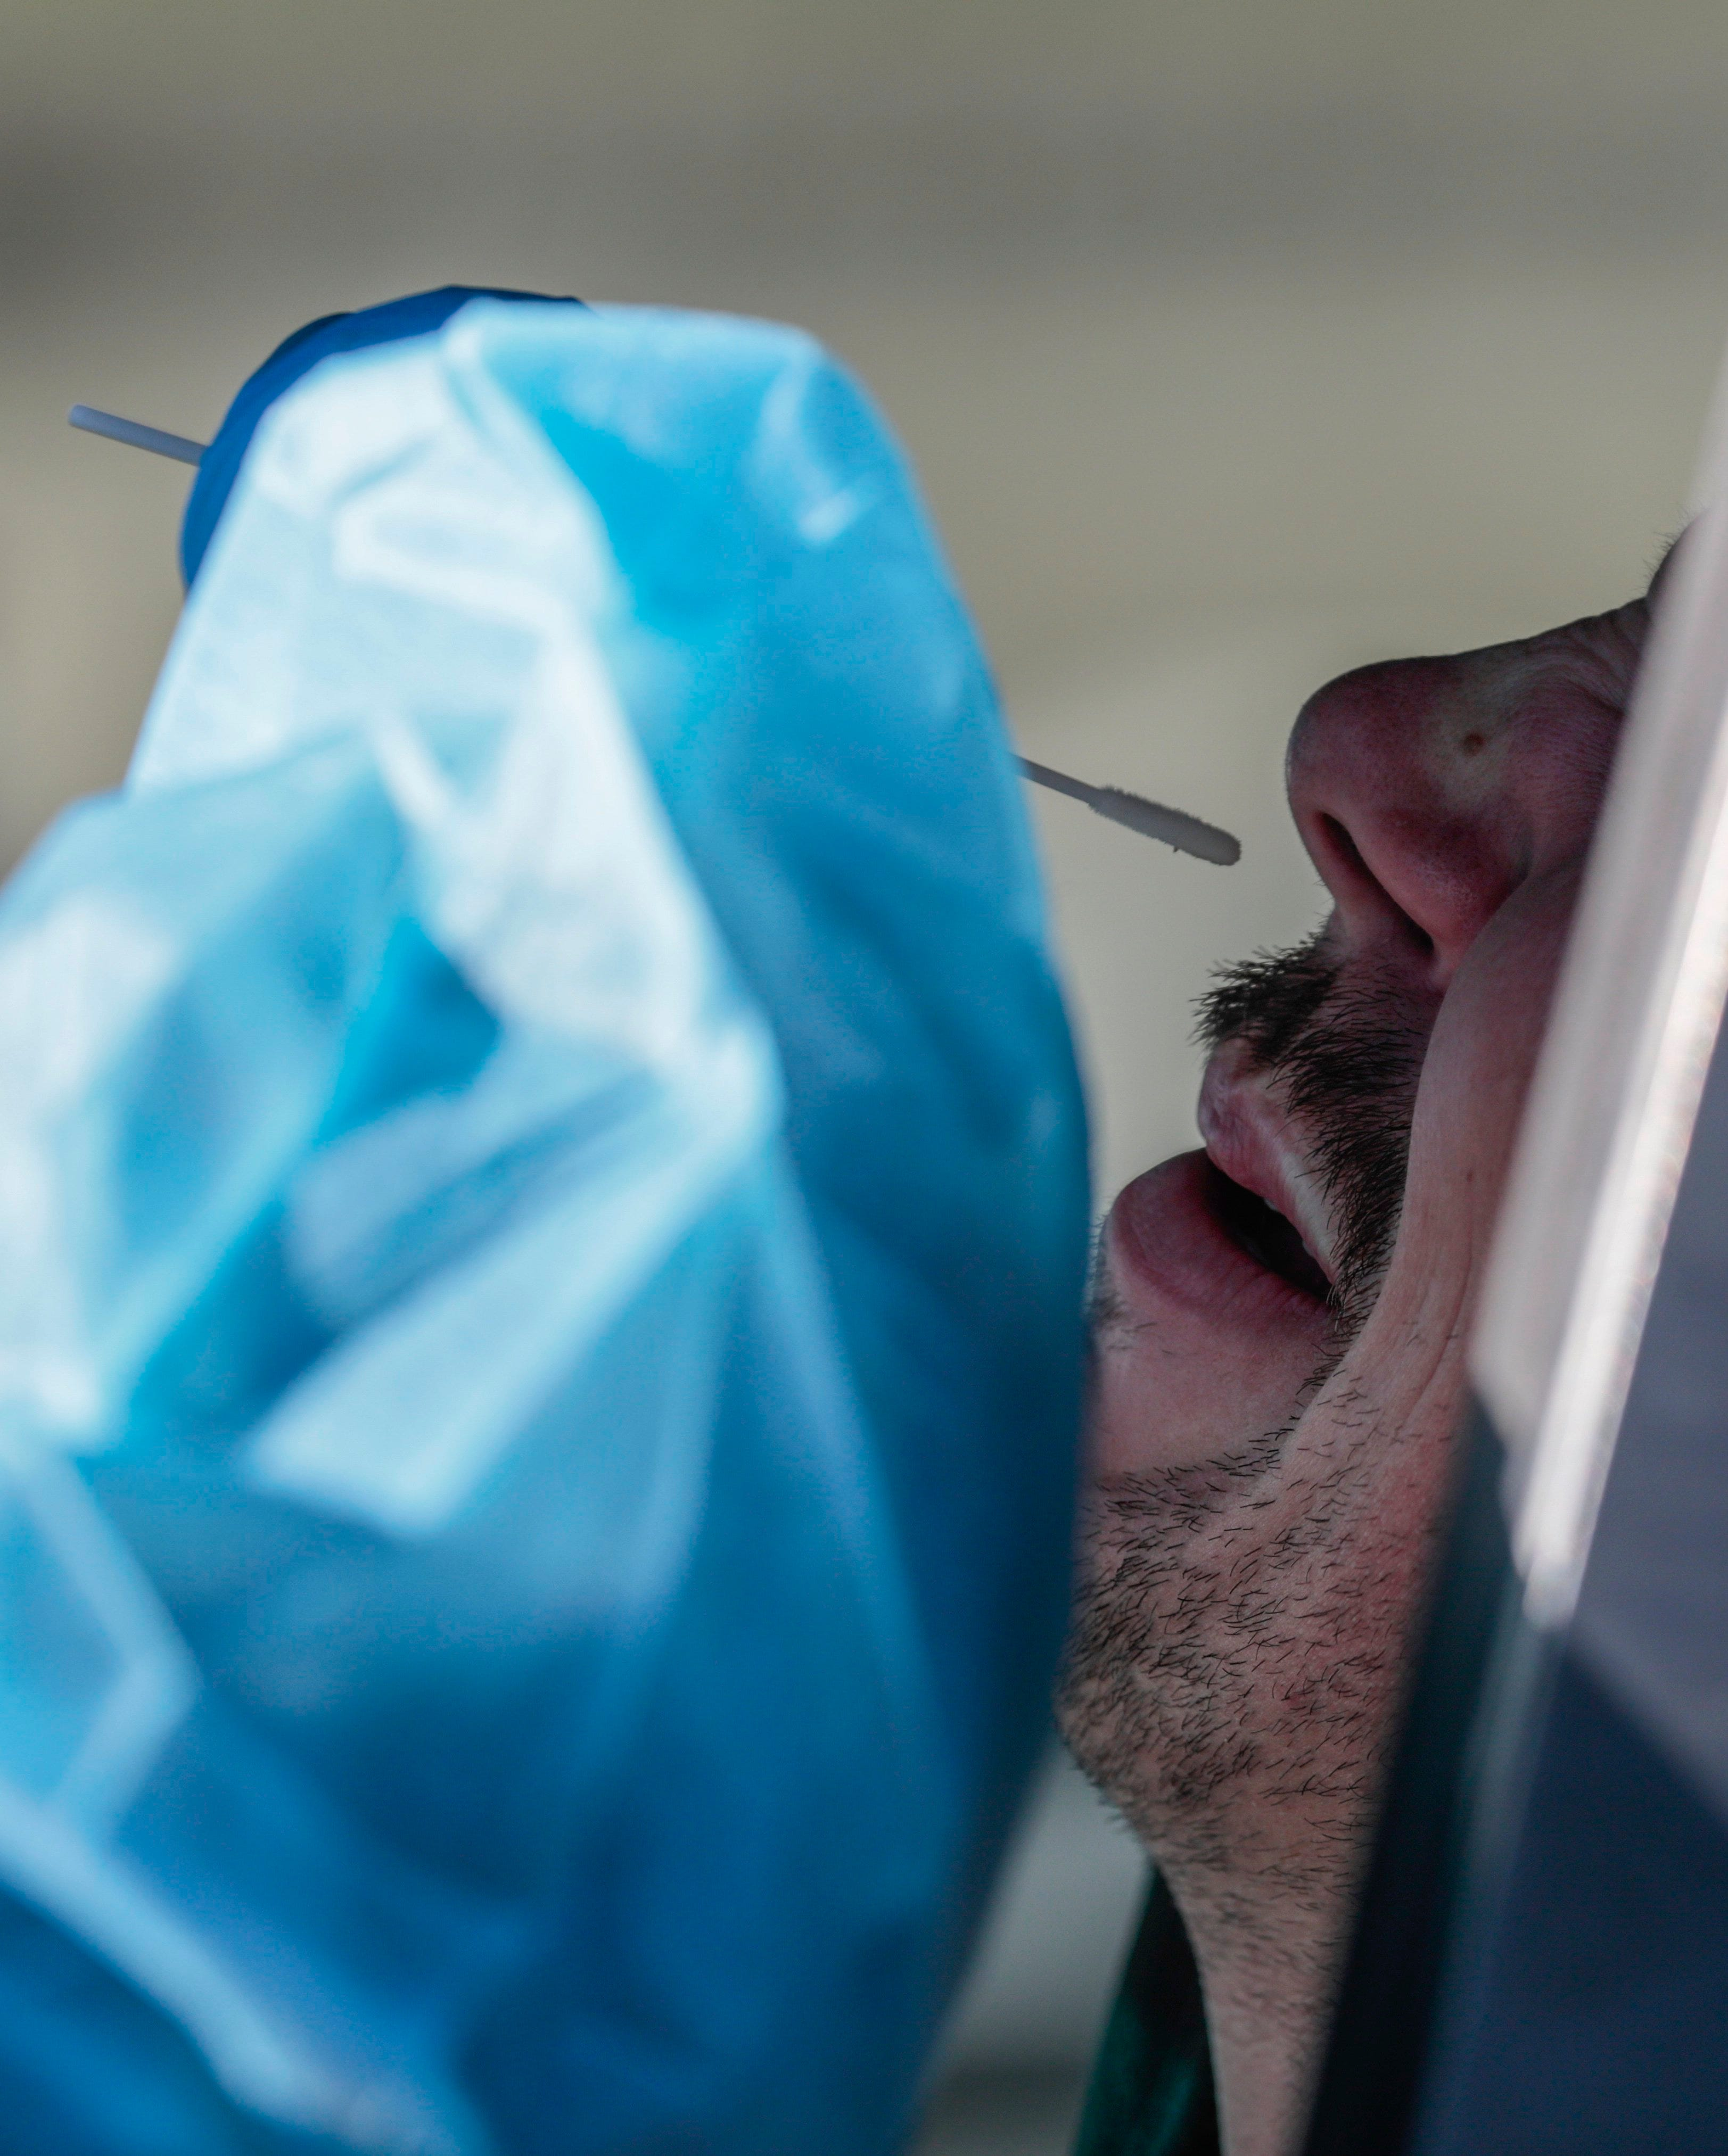 Ohio Reports 8 133 New Coronavirus Cases Amid Backlog Of Tests